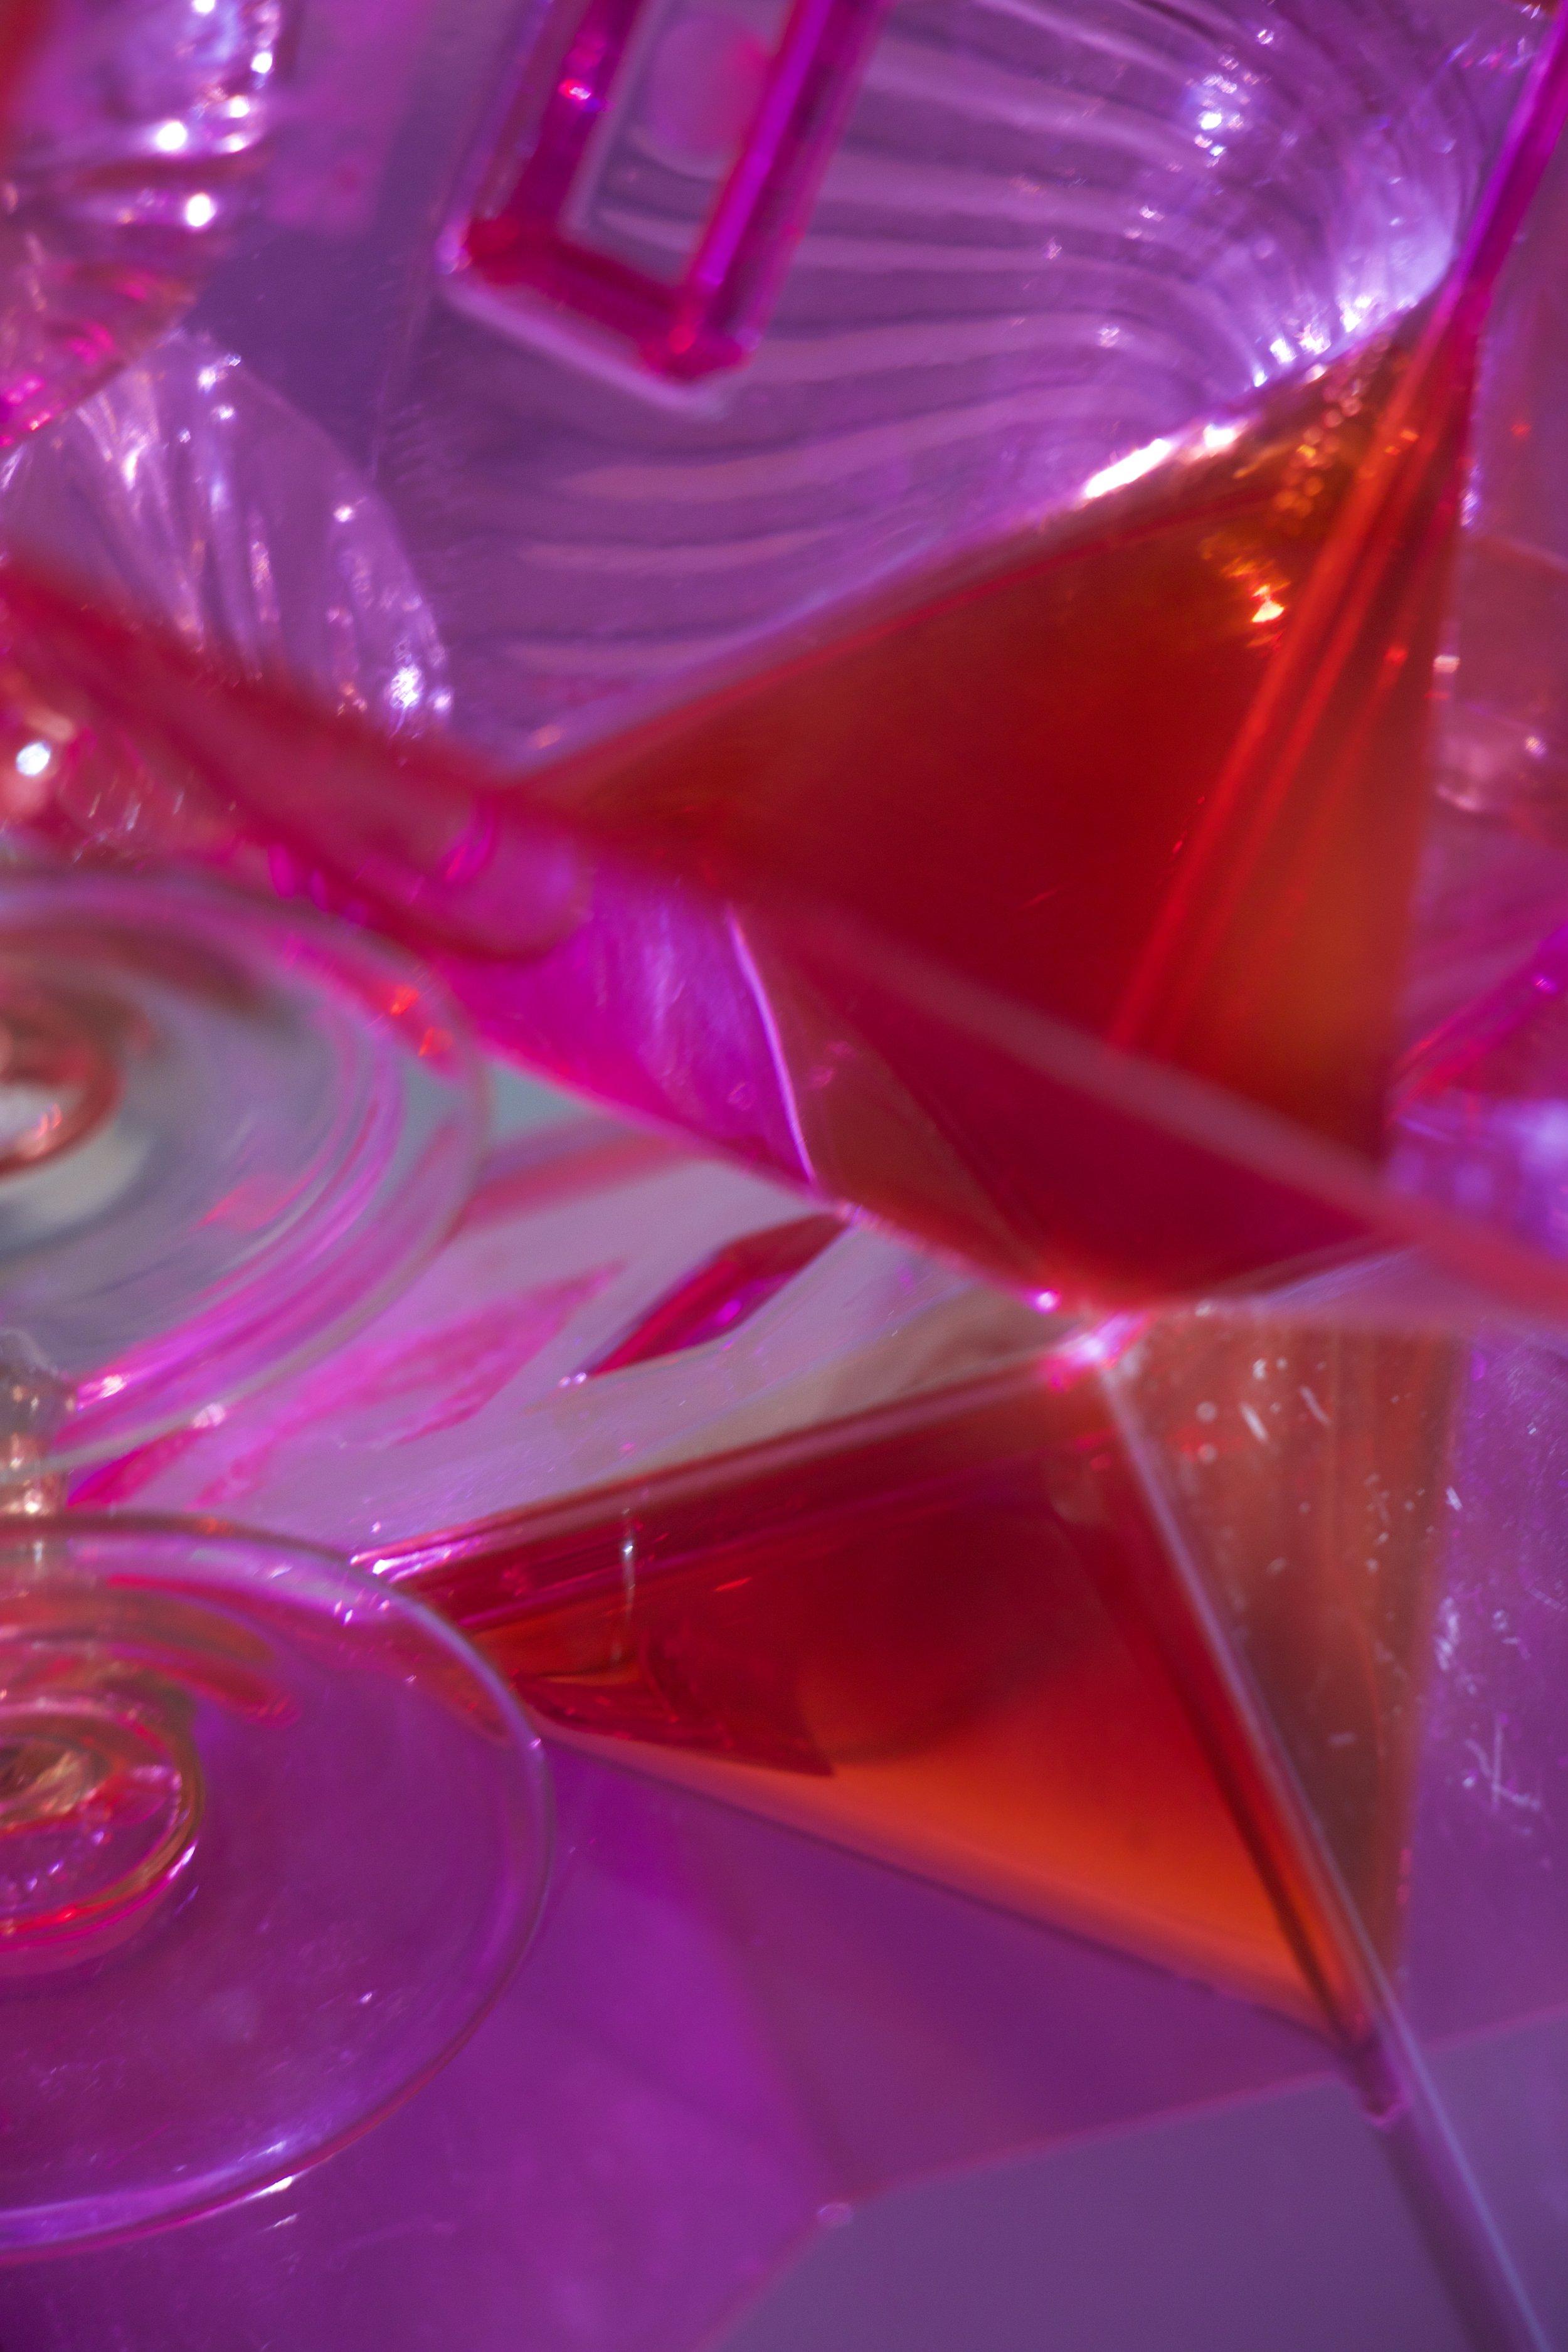 LIQUID PYRAMIDS. DESSERT GLASS & PLEXIGLASS BOX SERIES. 2017